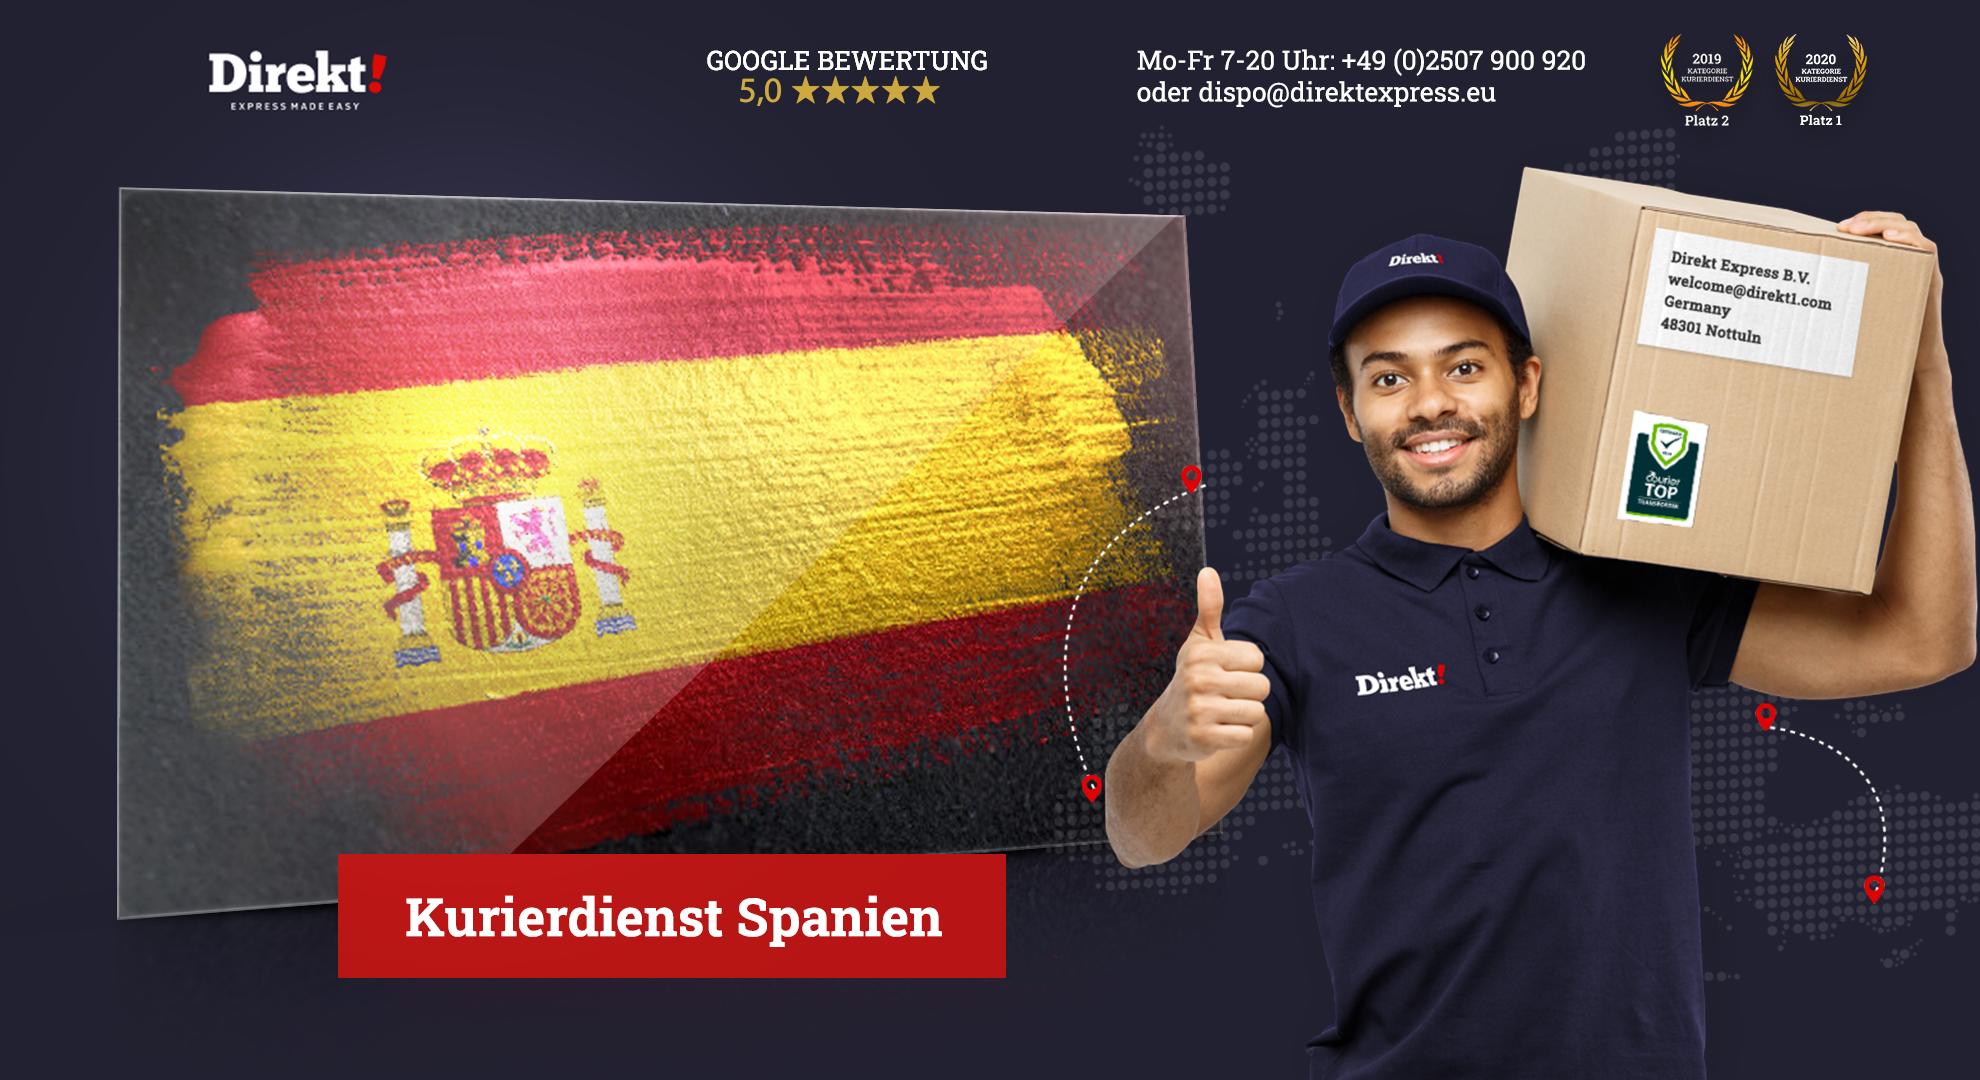 https://direkt1.com/wp-content/uploads/2021/03/Kurierdienst-Spanien-buchen.png